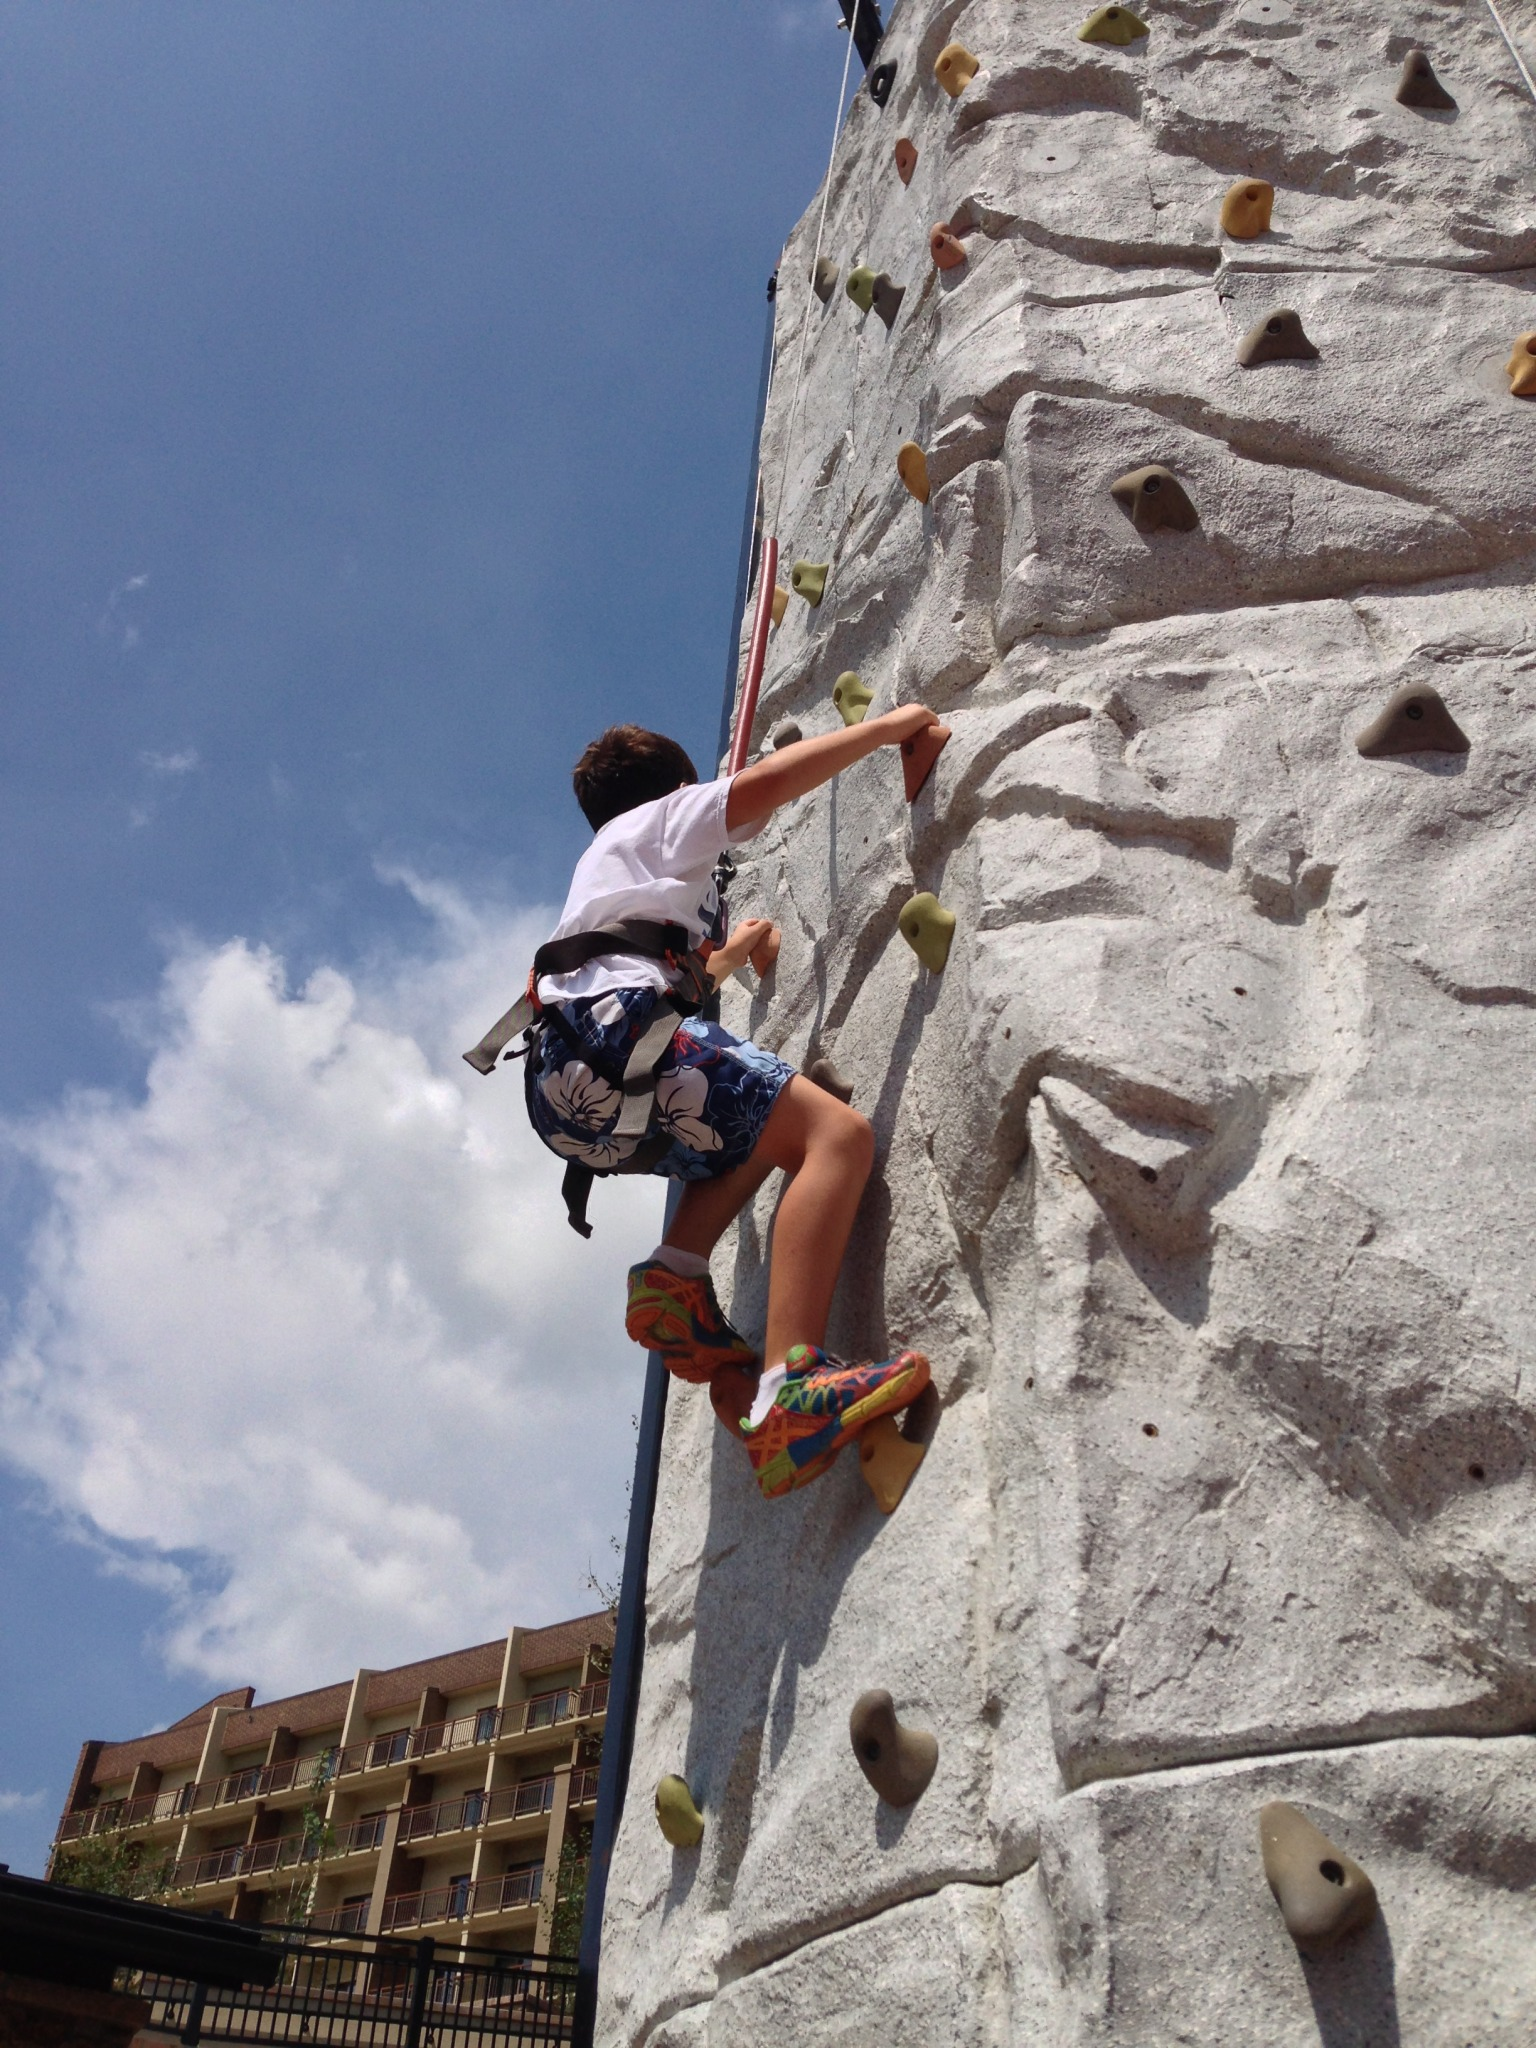 The climbing wall at Steamboat